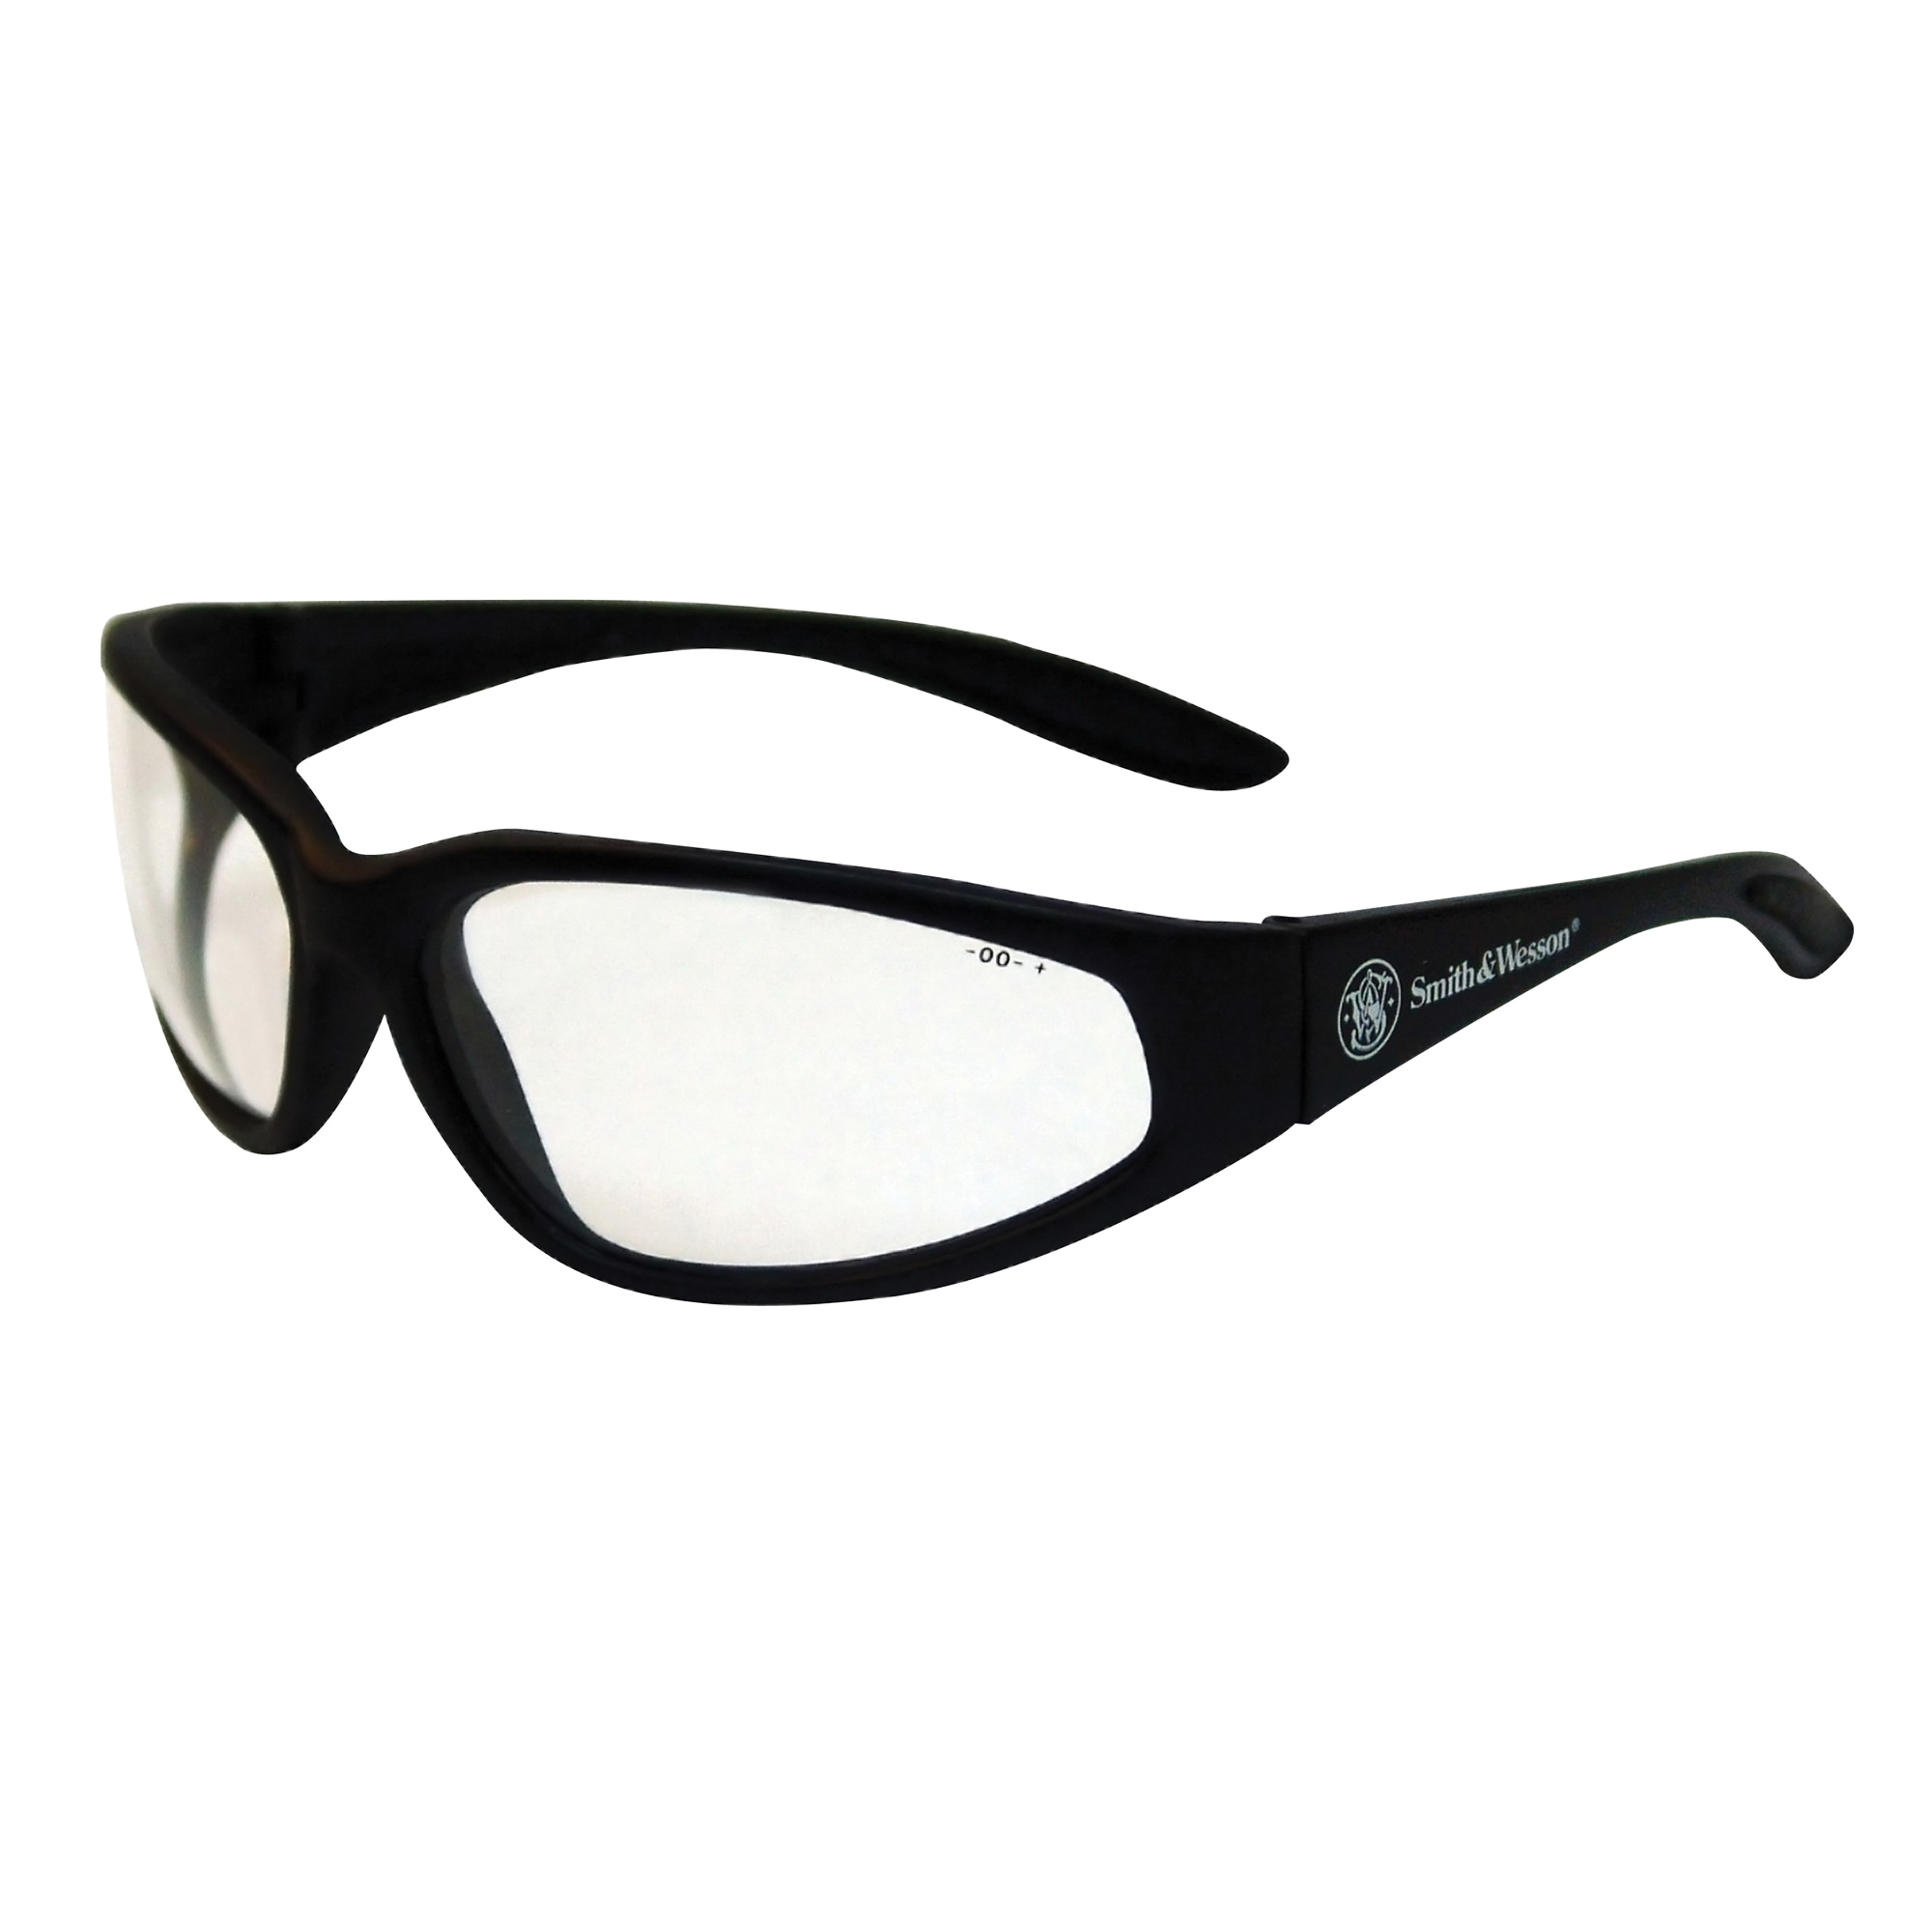 Kimberly Clark* Smith & Wesson® 19853 Phantom Safety Glasses, Anti-Scratch, Smoke Lens, Frameless Frame, Black, Metal Frame, Polycarbonate Lens, ANSI Z87.1+2010